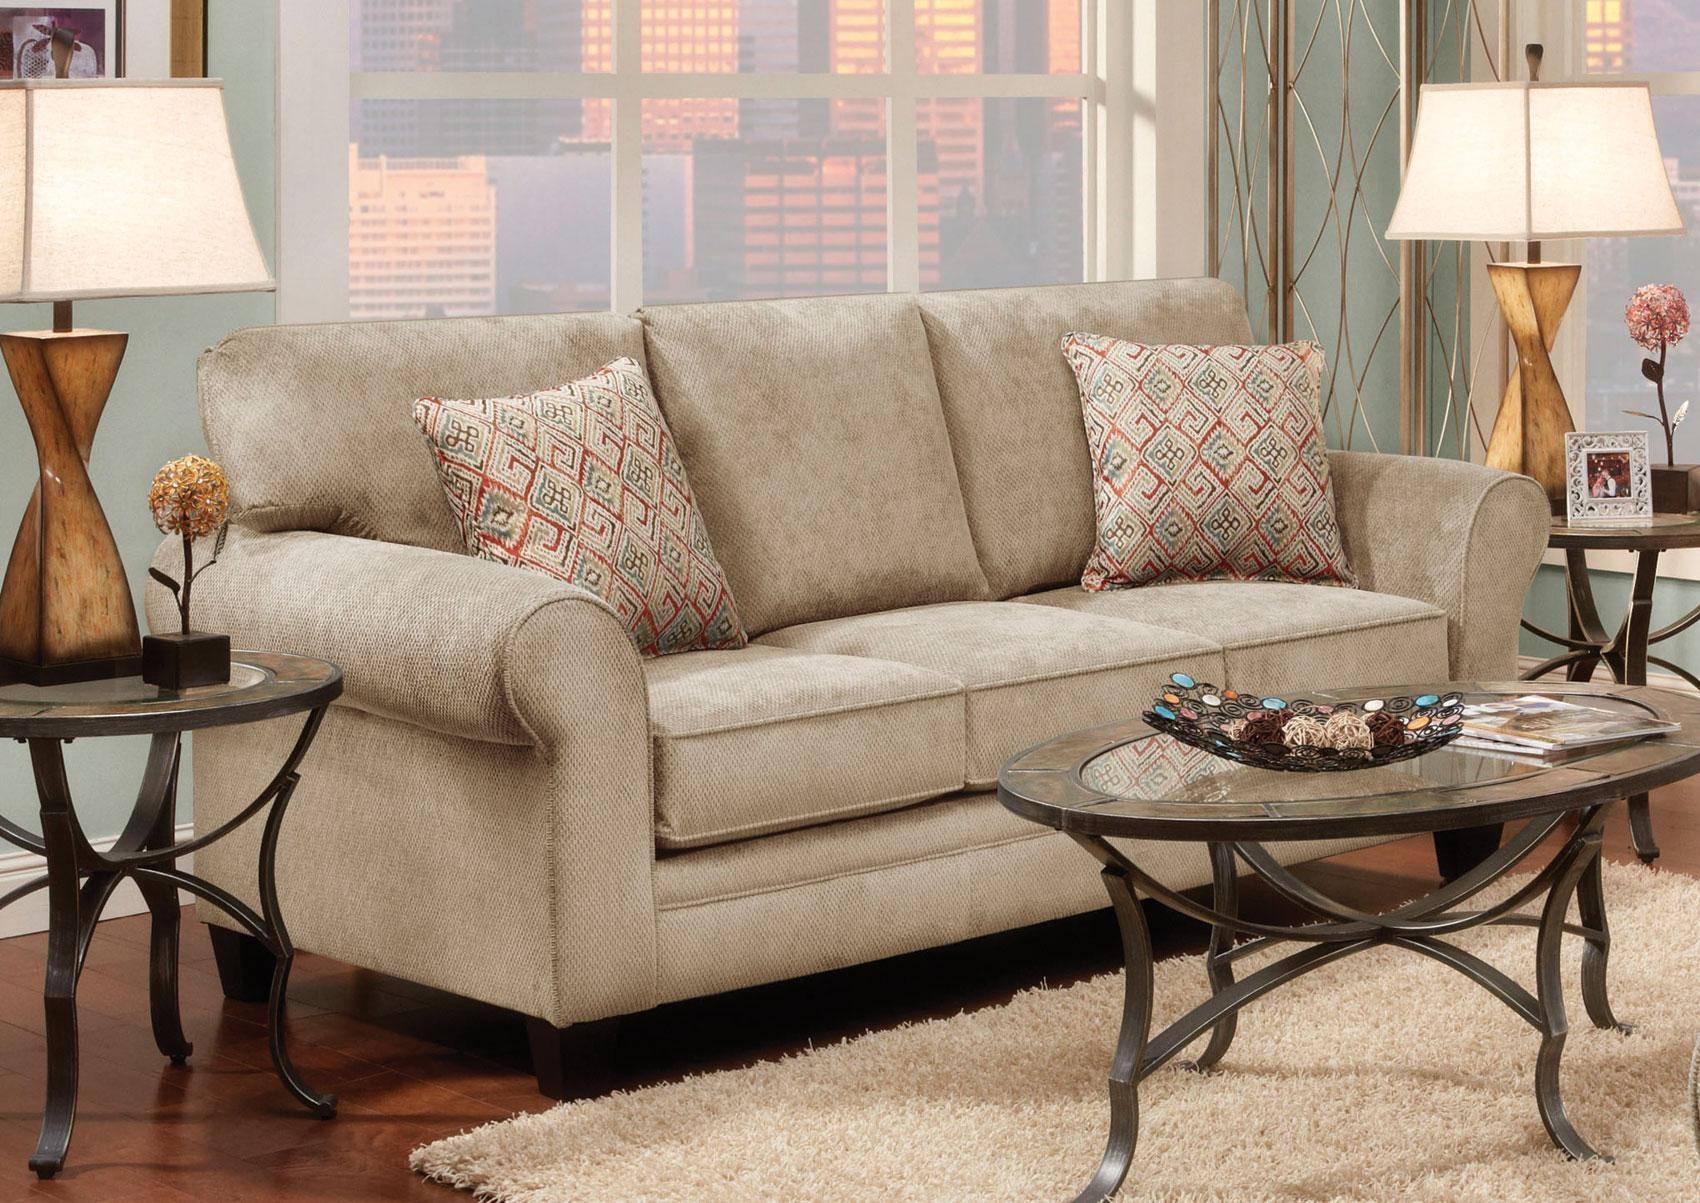 J Henry Llc Living Room Tanglewood Sofa Sand 051888 Furniture Fair Cincinnati Dayton